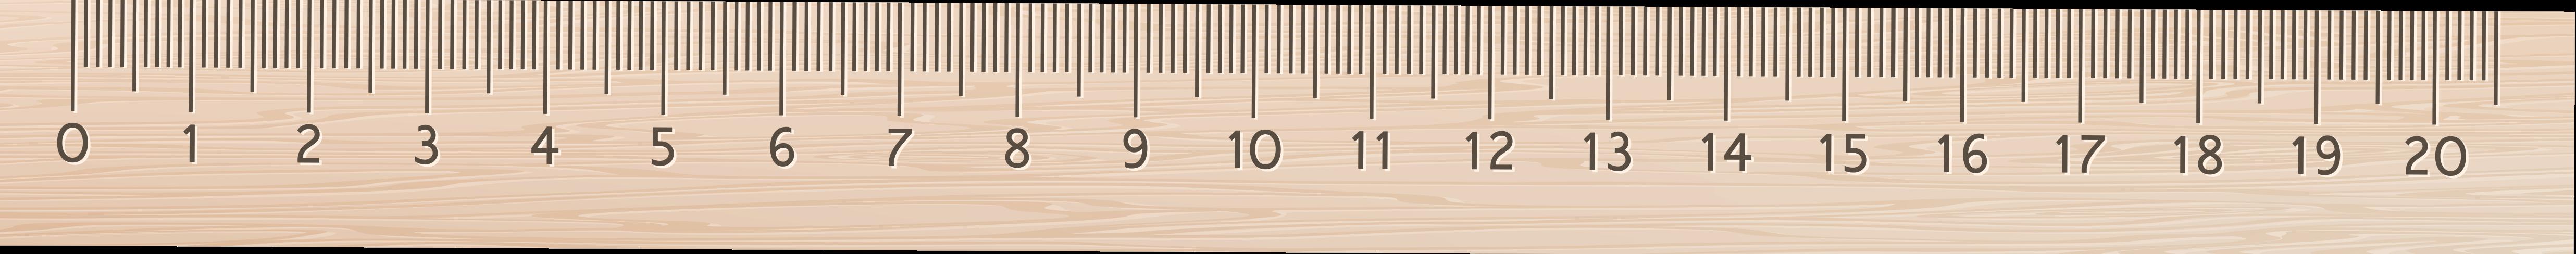 Everyday-Math-Grade-2-Home-Link-7.4-Answer-Key-2